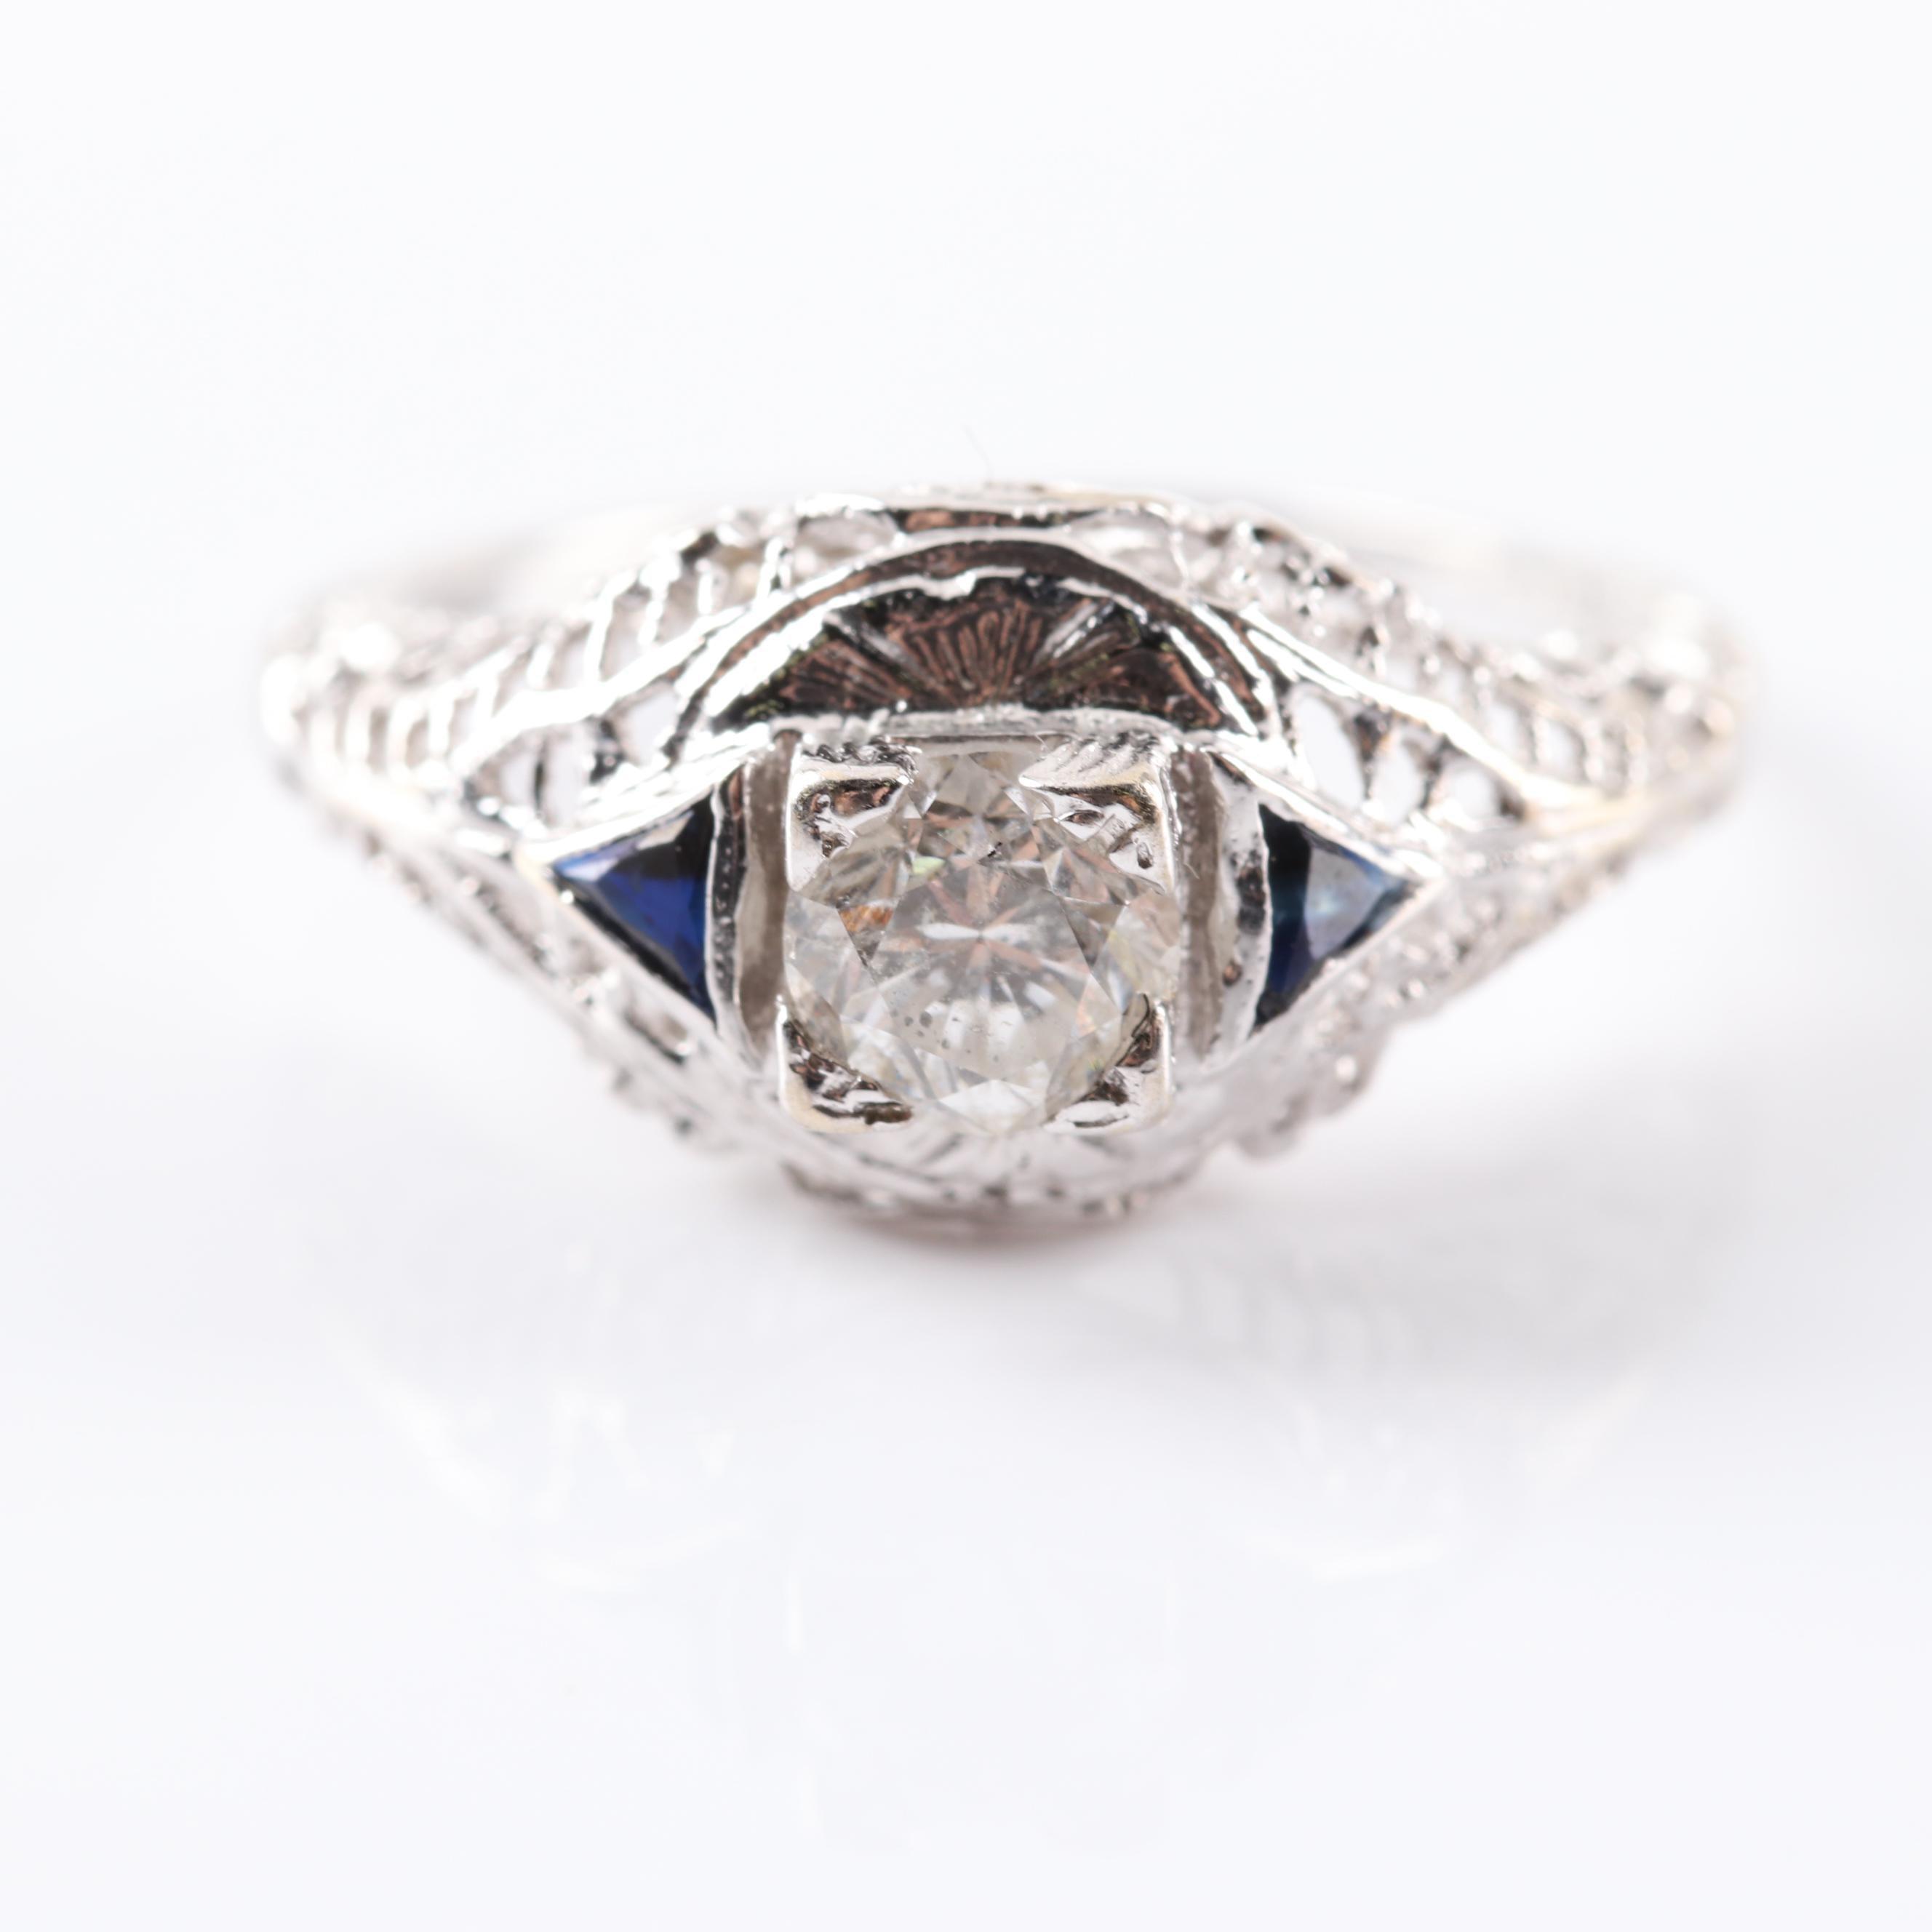 14K White Gold Diamond and Sapphire Filigree Ring